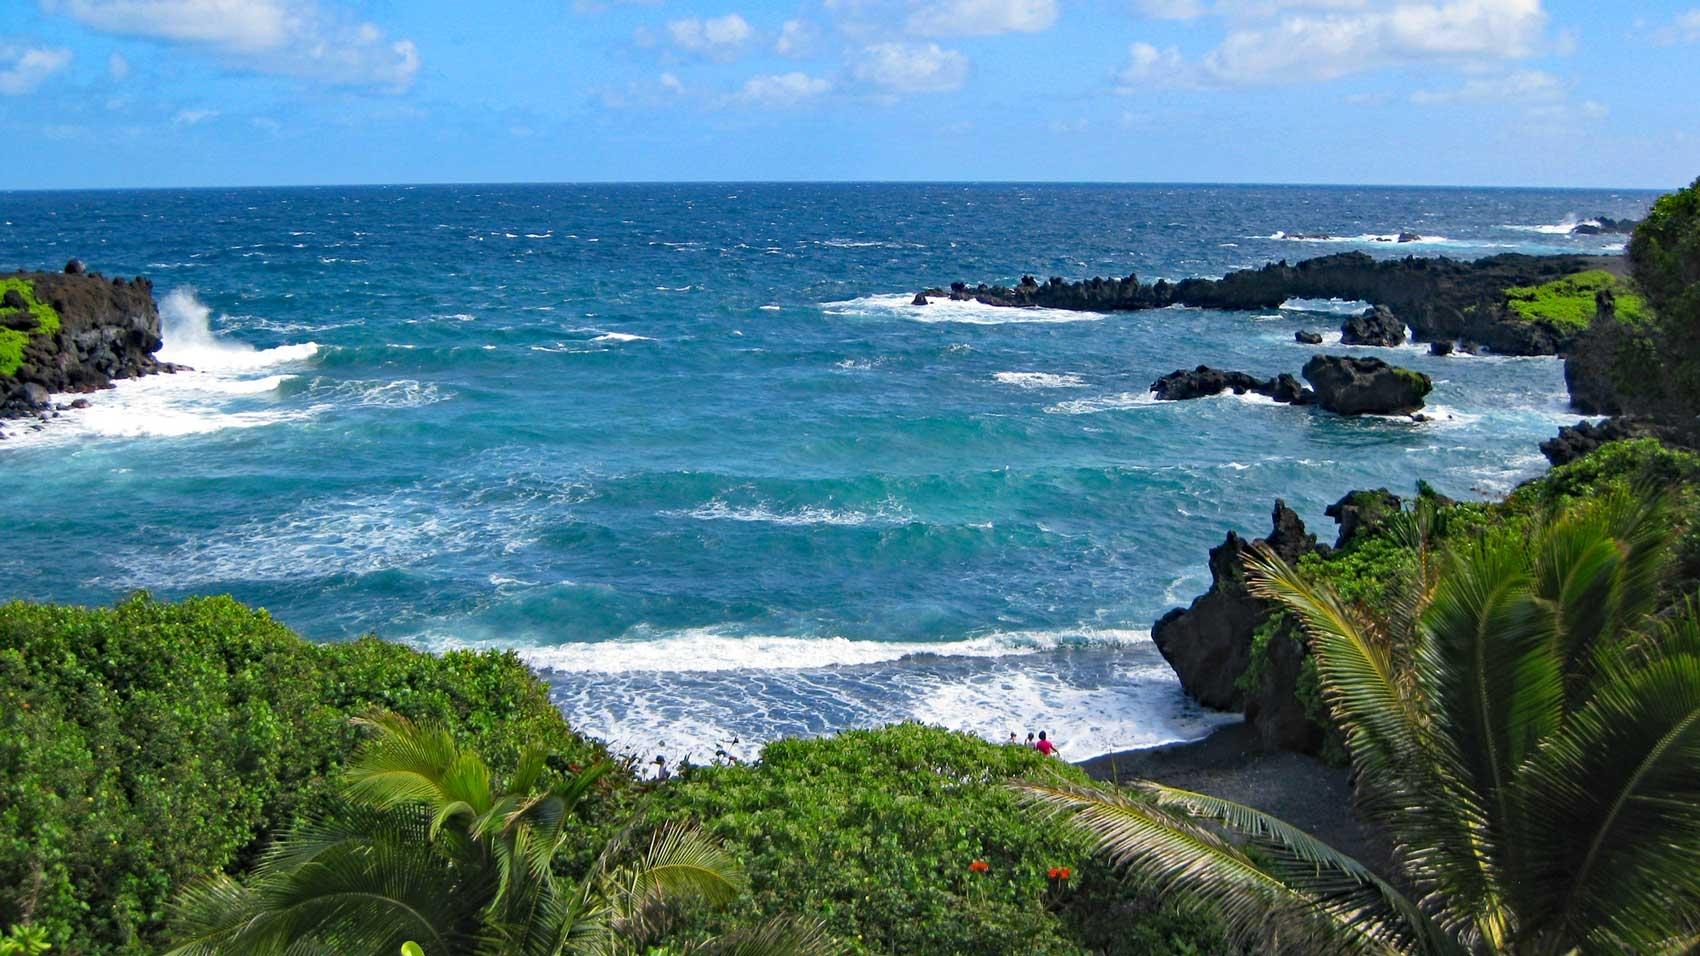 Black sand at Honokalani Beach, Road to Hana views, areas to stay in Maui